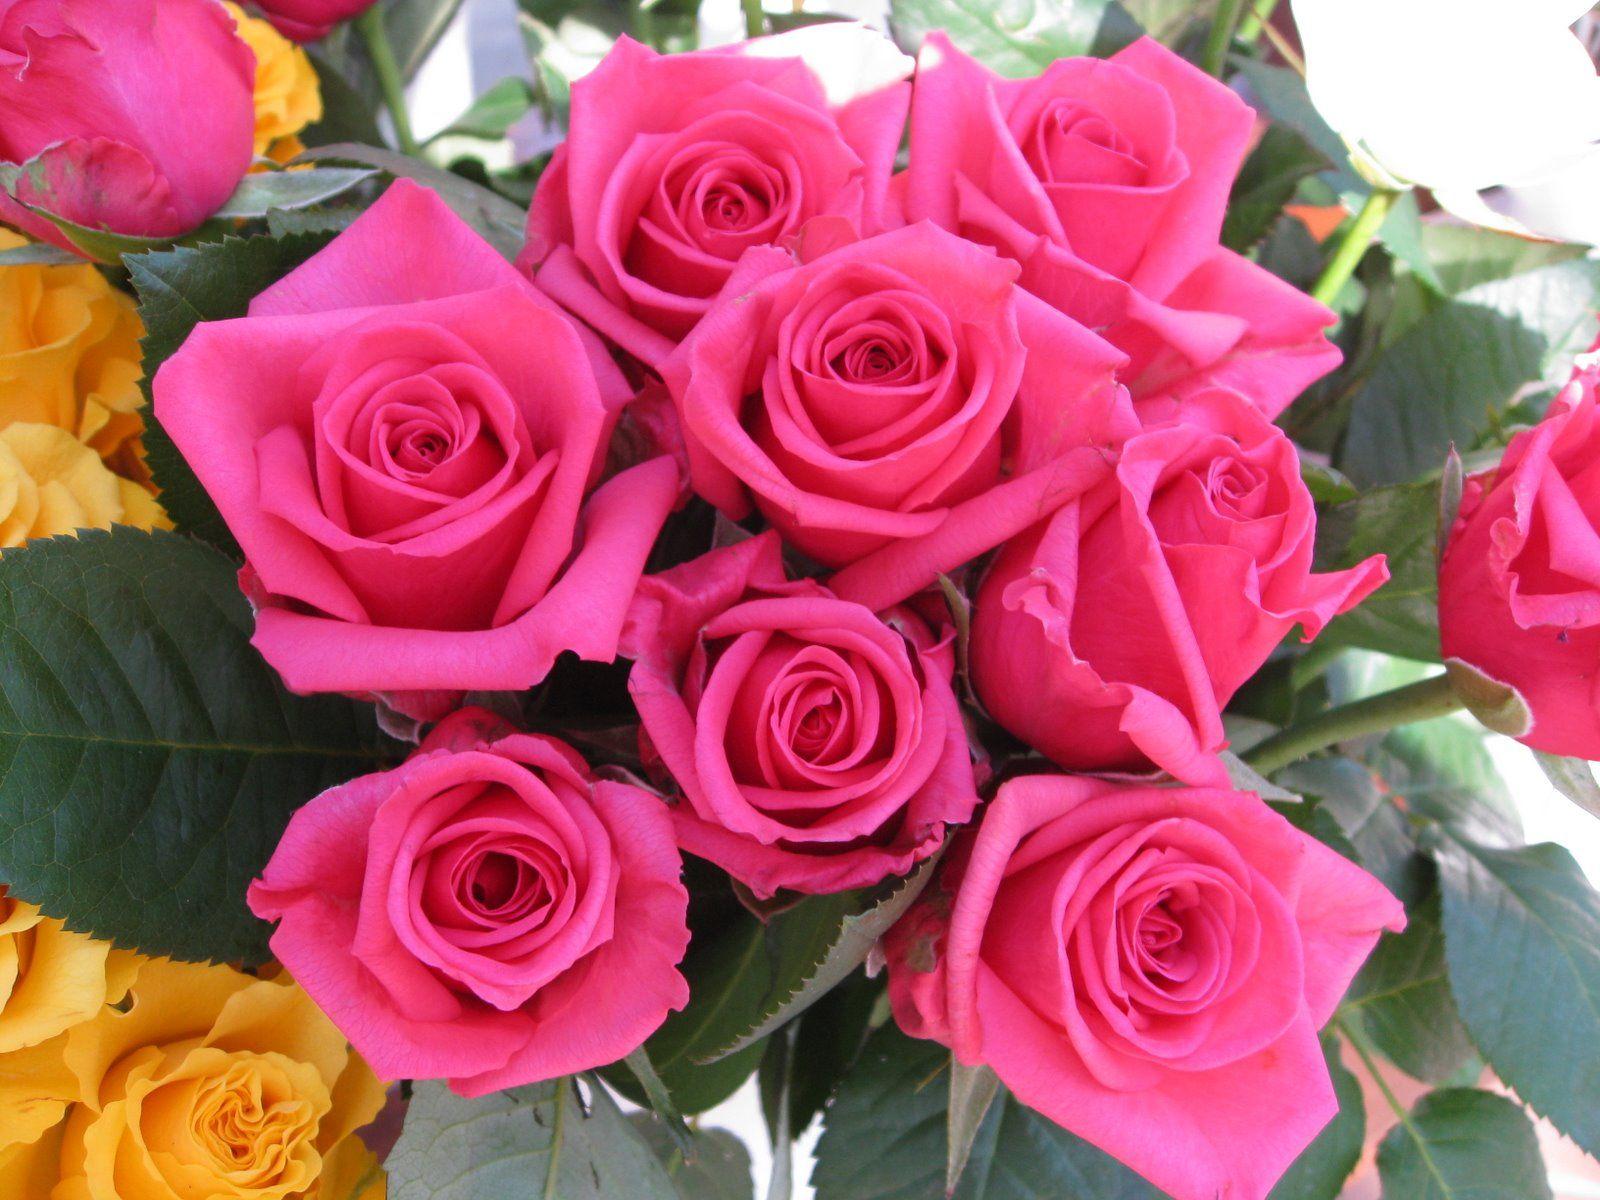 Pin By Lisa Jackson On Wedding Flower Pinterest Pink Roses